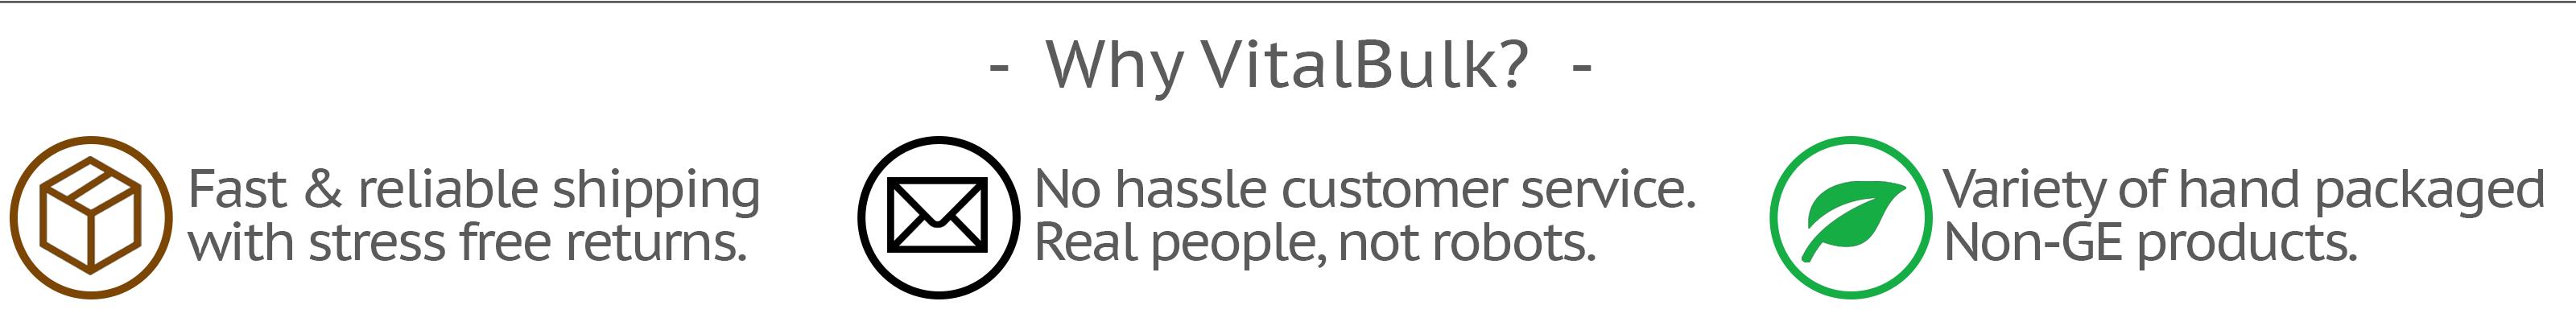 Why VitalBulk?